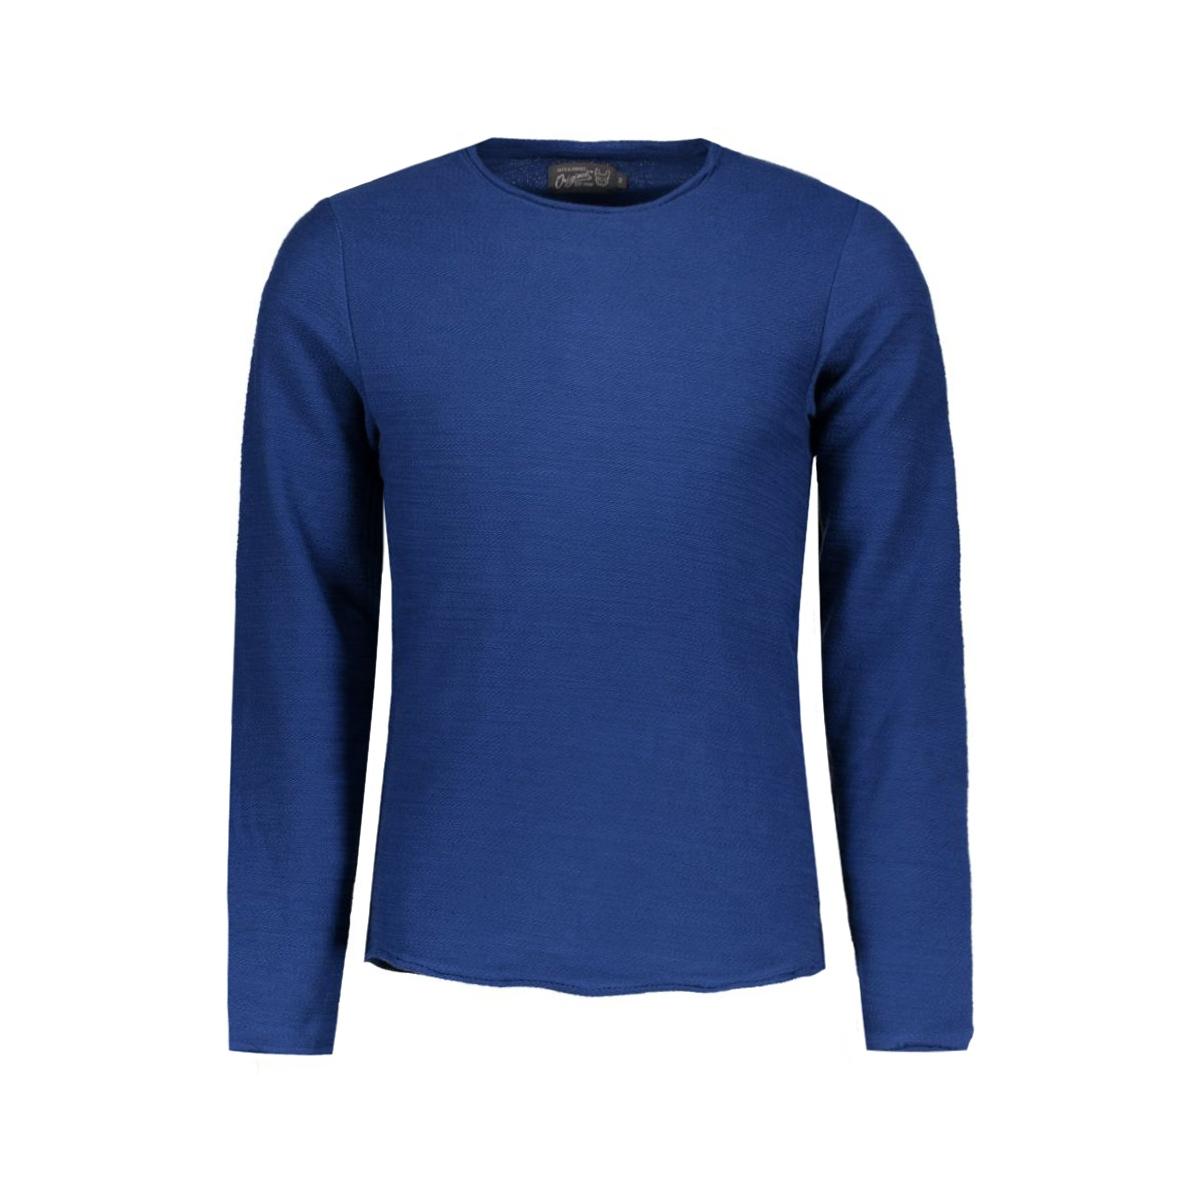 jorraw sweat crew neck 12115020 jack & jones trui estate blue